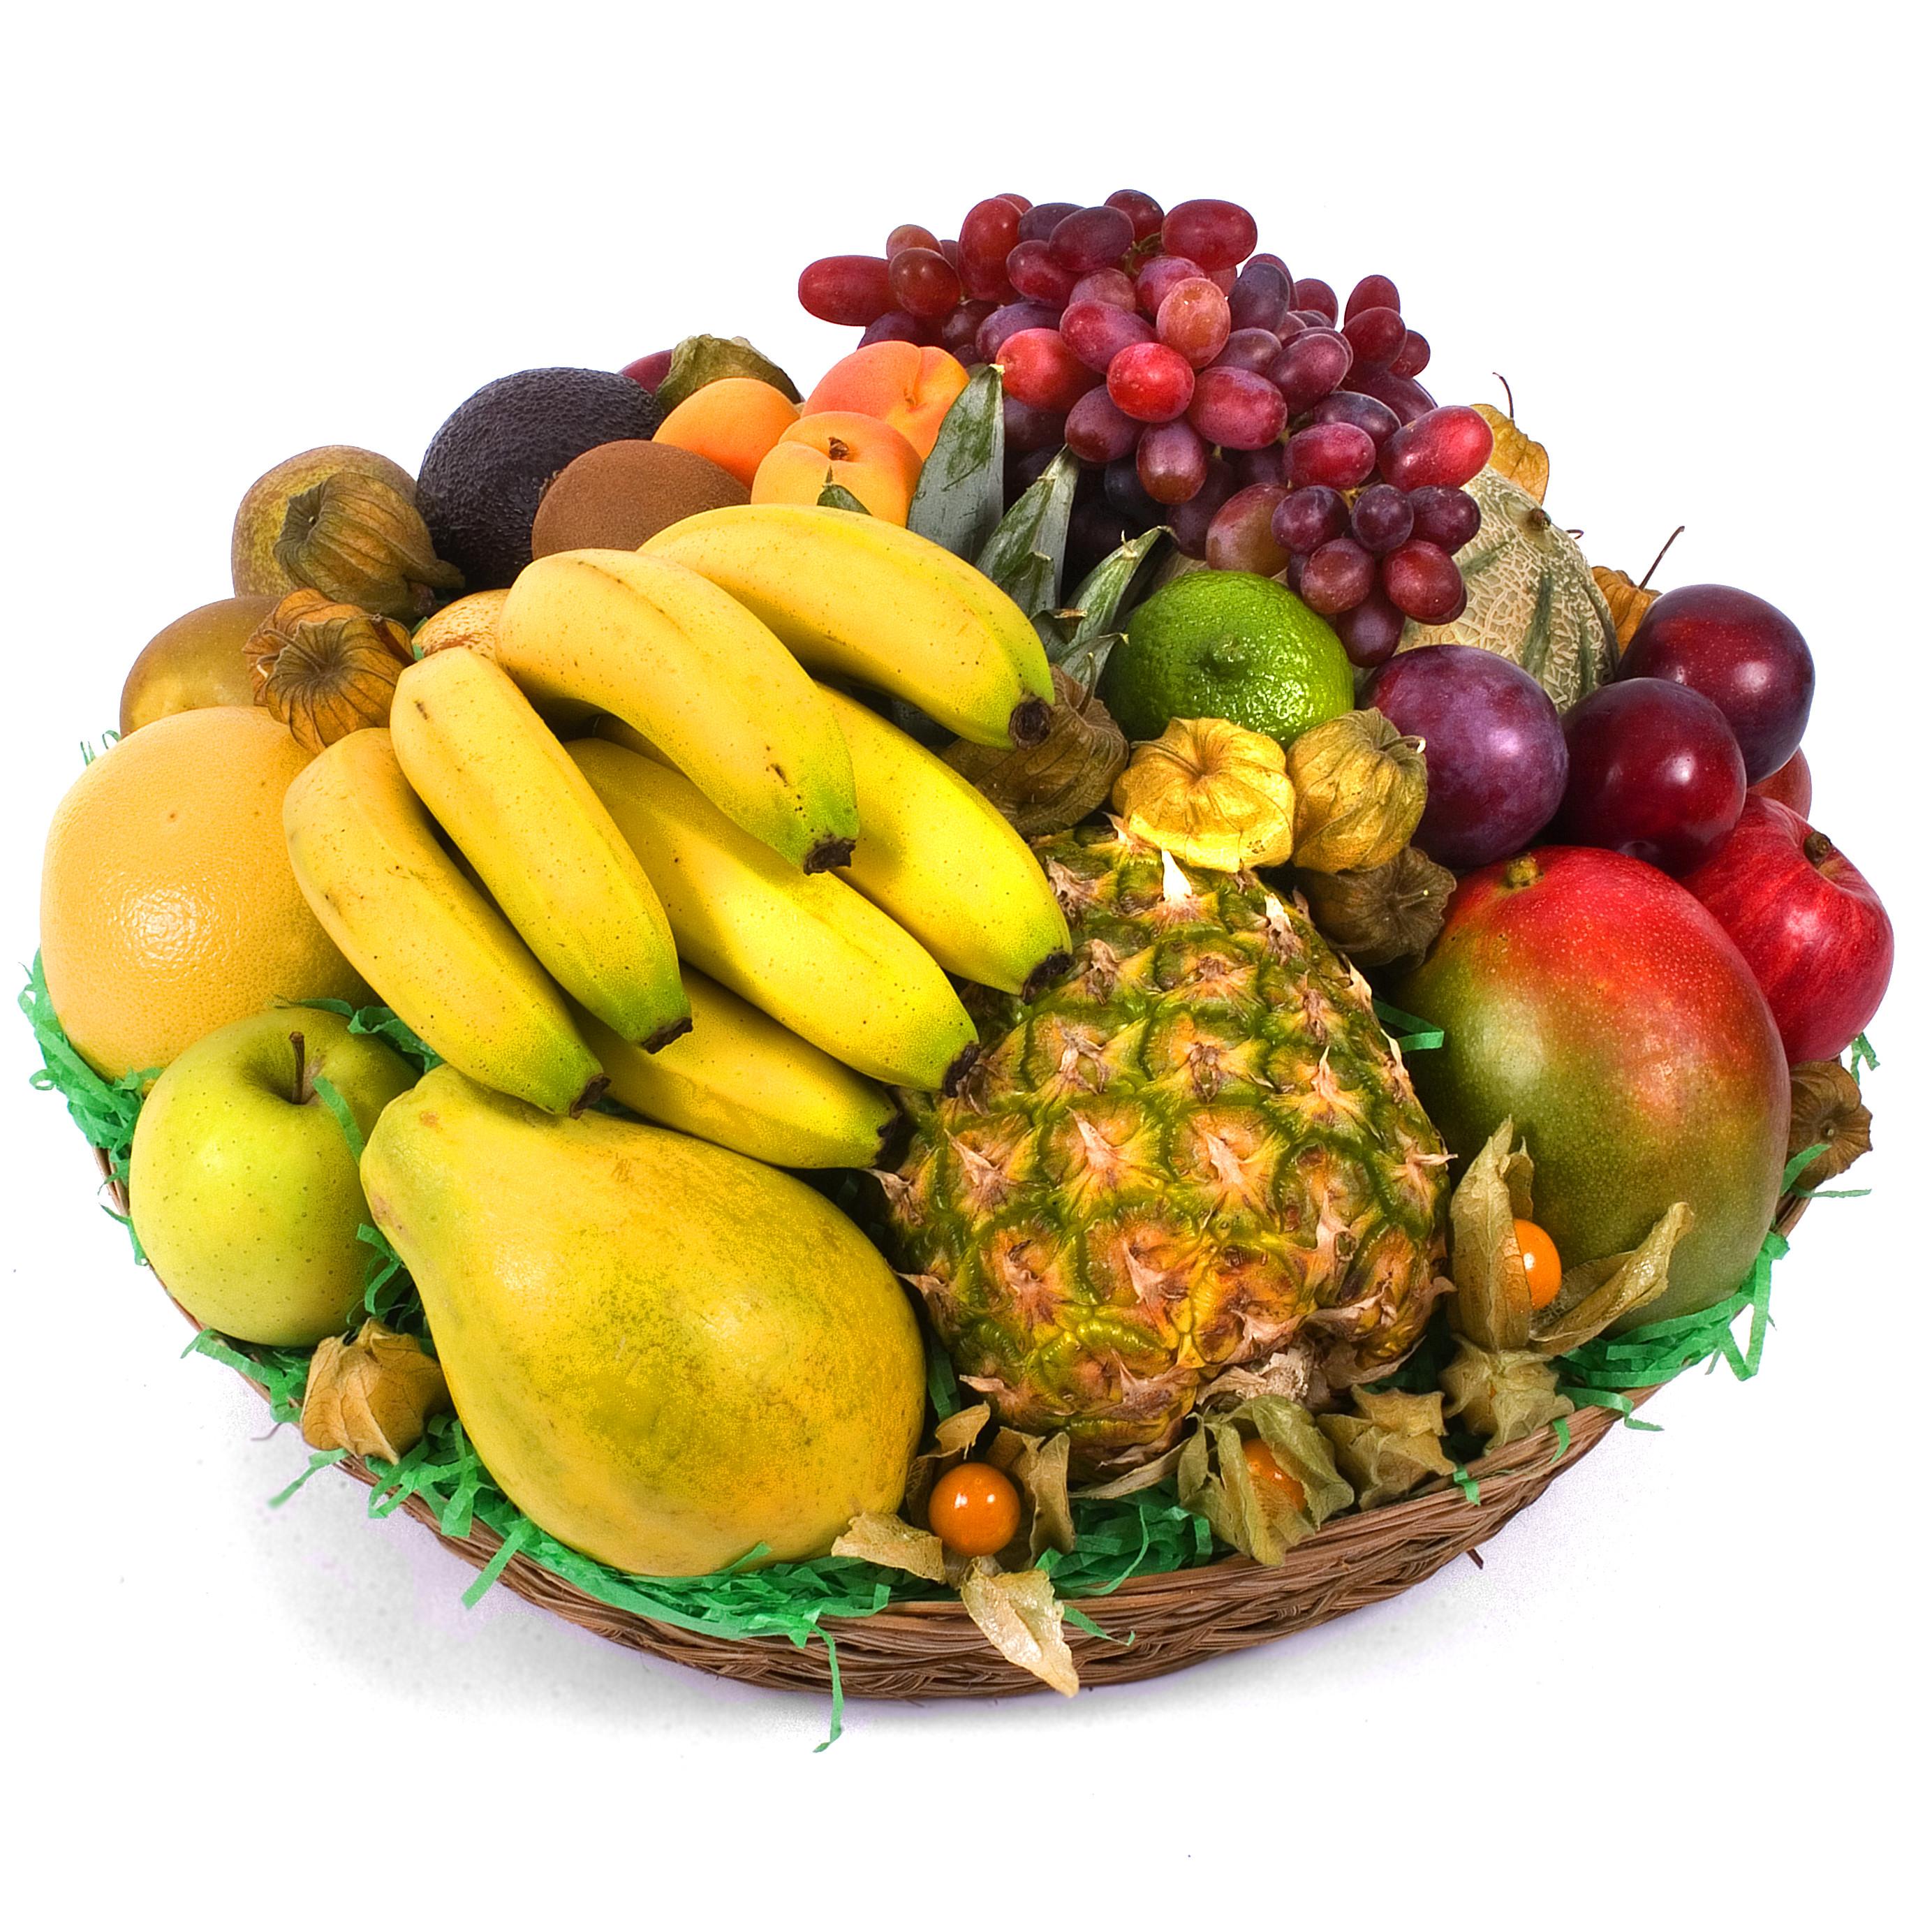 Tropical Fruit Basket Delivery to Cebu | Online Order to Cebu ...